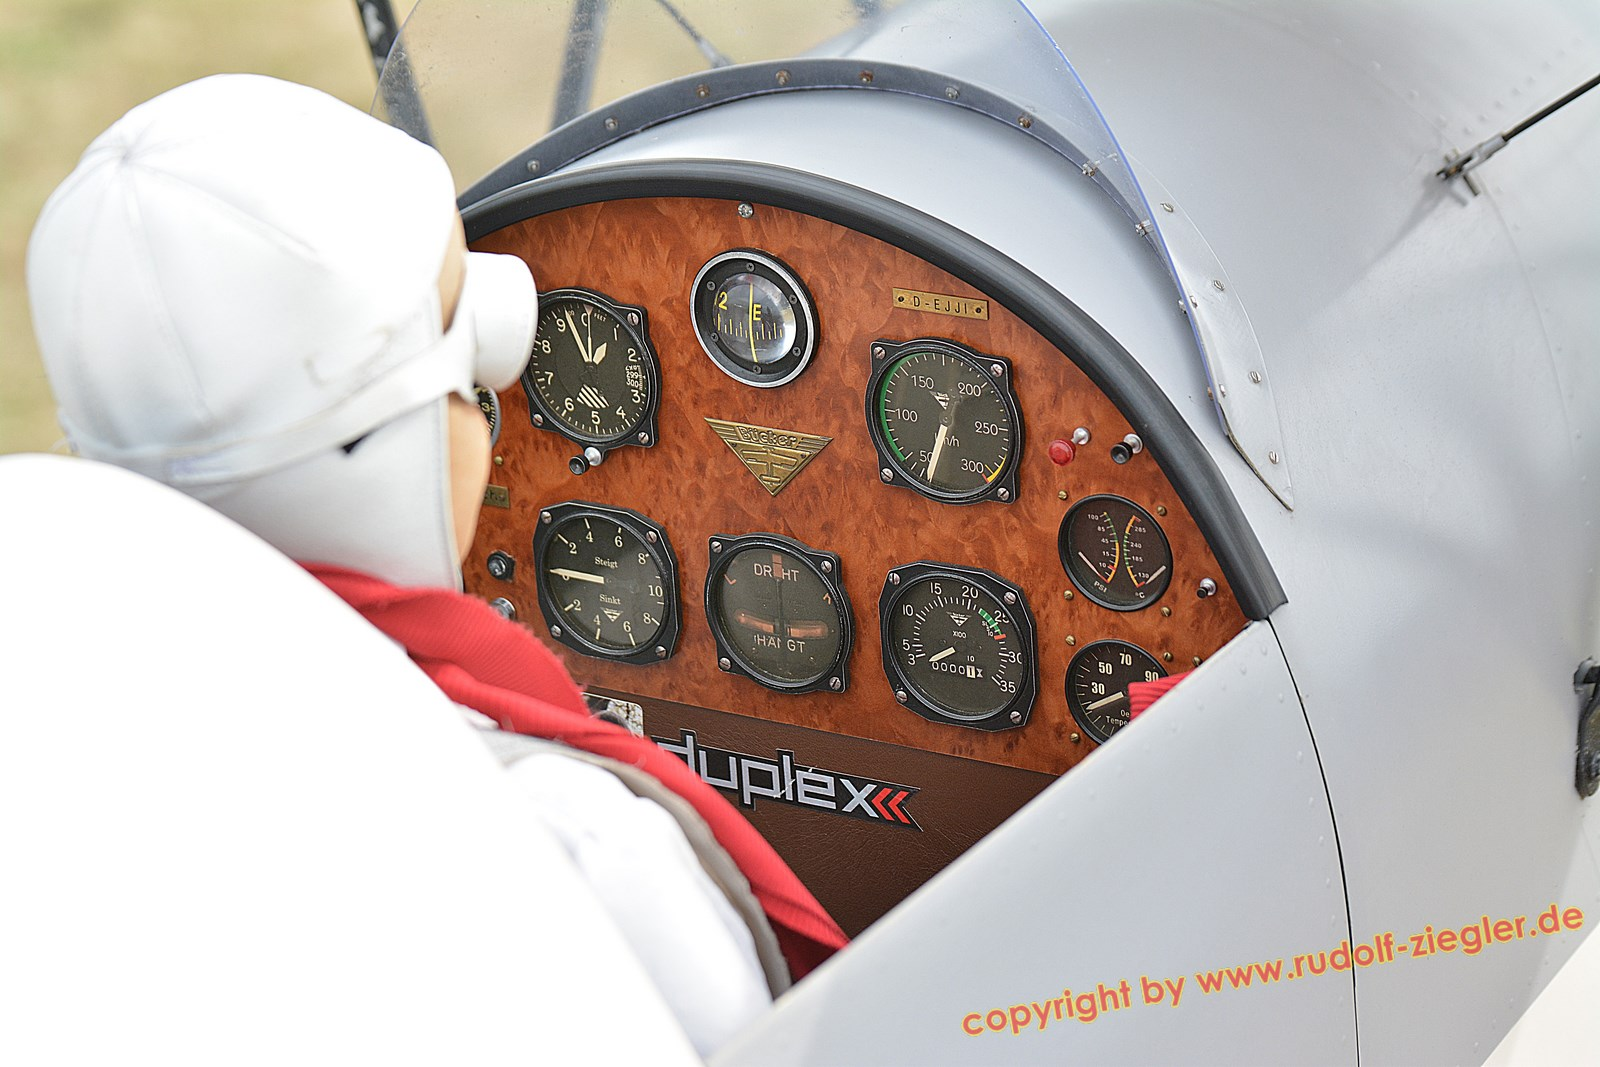 UNITED RC Flights 2016 am Flugplatz Bayreuth 009-S (1600x1200)